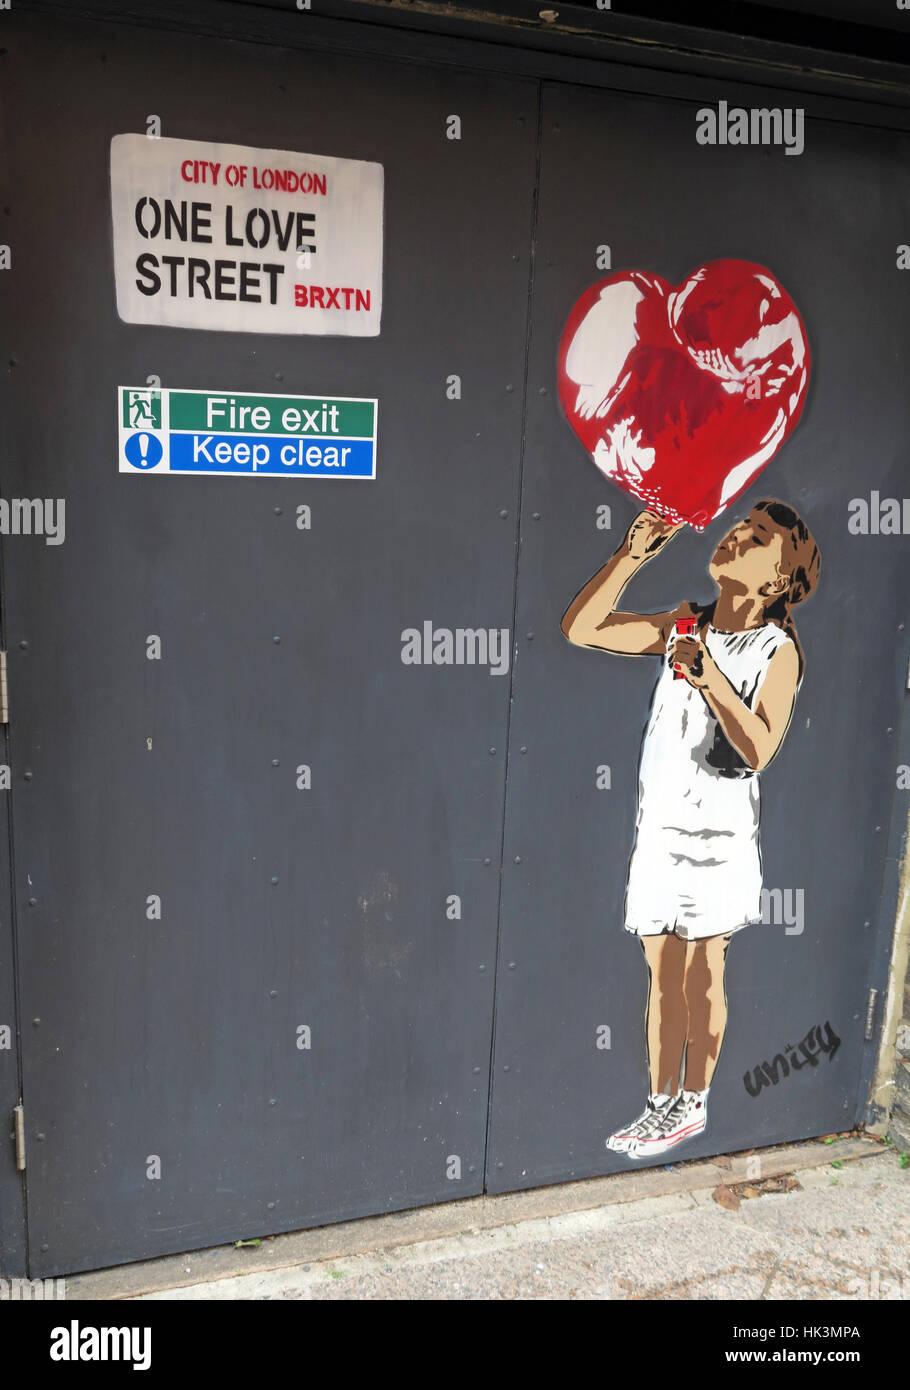 Brixton,England,UK,Bellefields,Road,city,centre,One,love,luv,street,BRXTN,girl,baloon,artwork,art,work,door,fire,exit,city,of,London,Bellefields